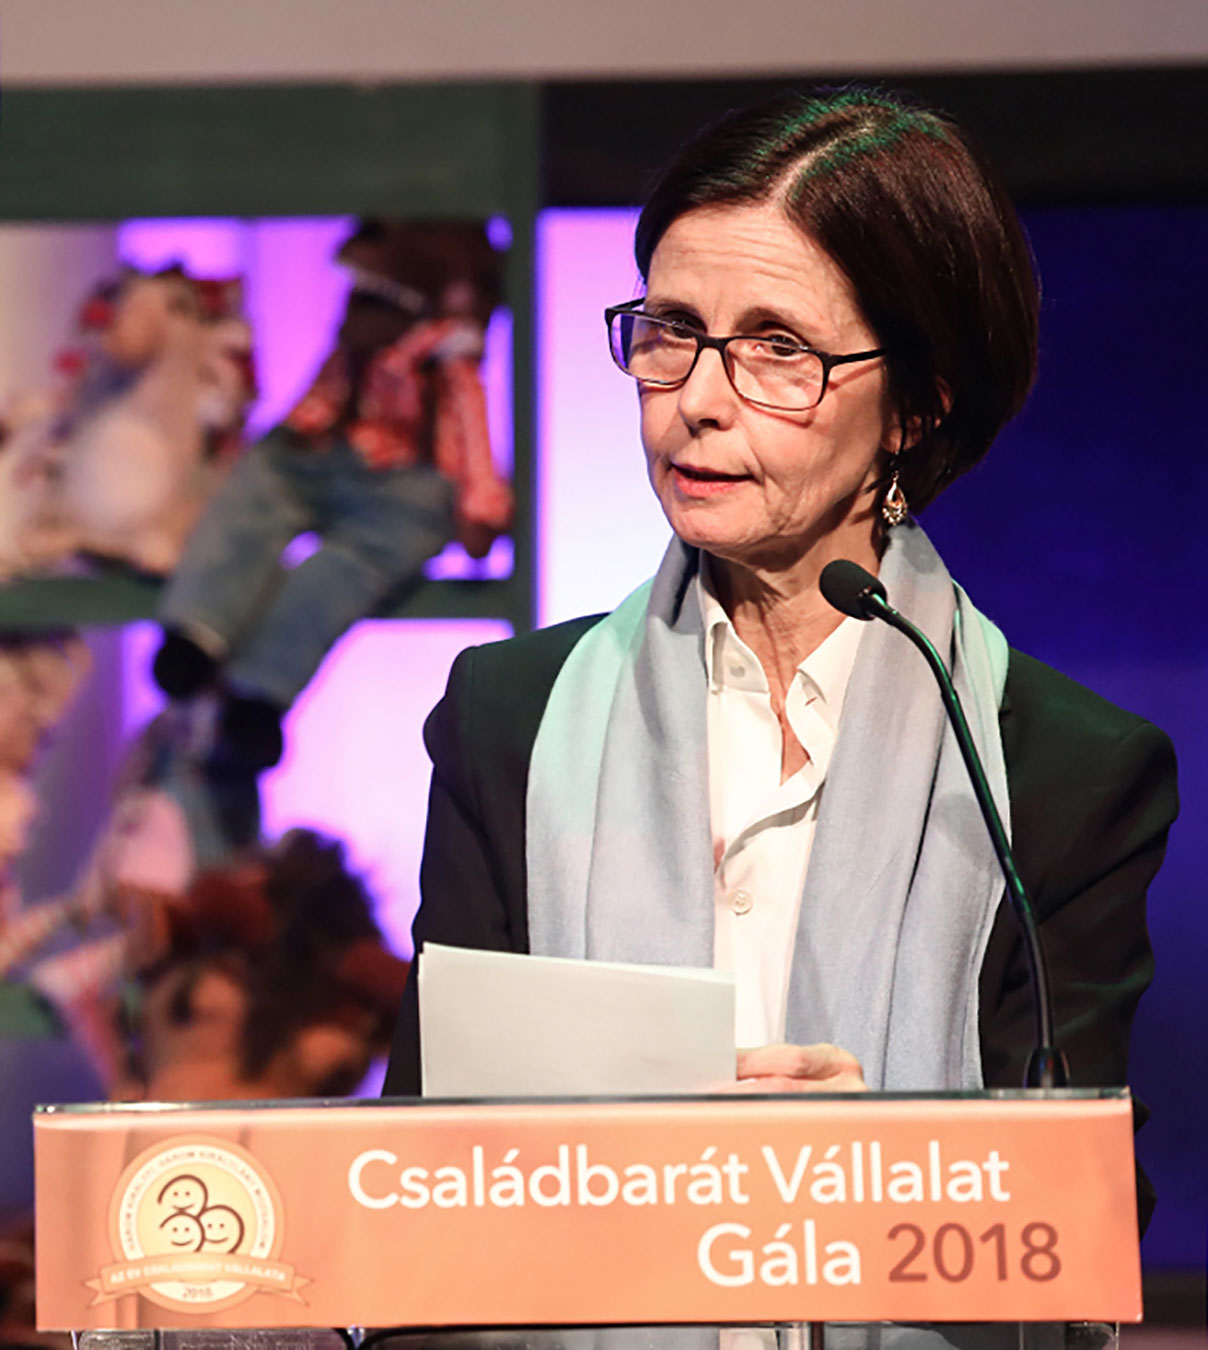 fr-pascale-andreani-csaladbarat-vallalat-gala-2018-2-web.jpg